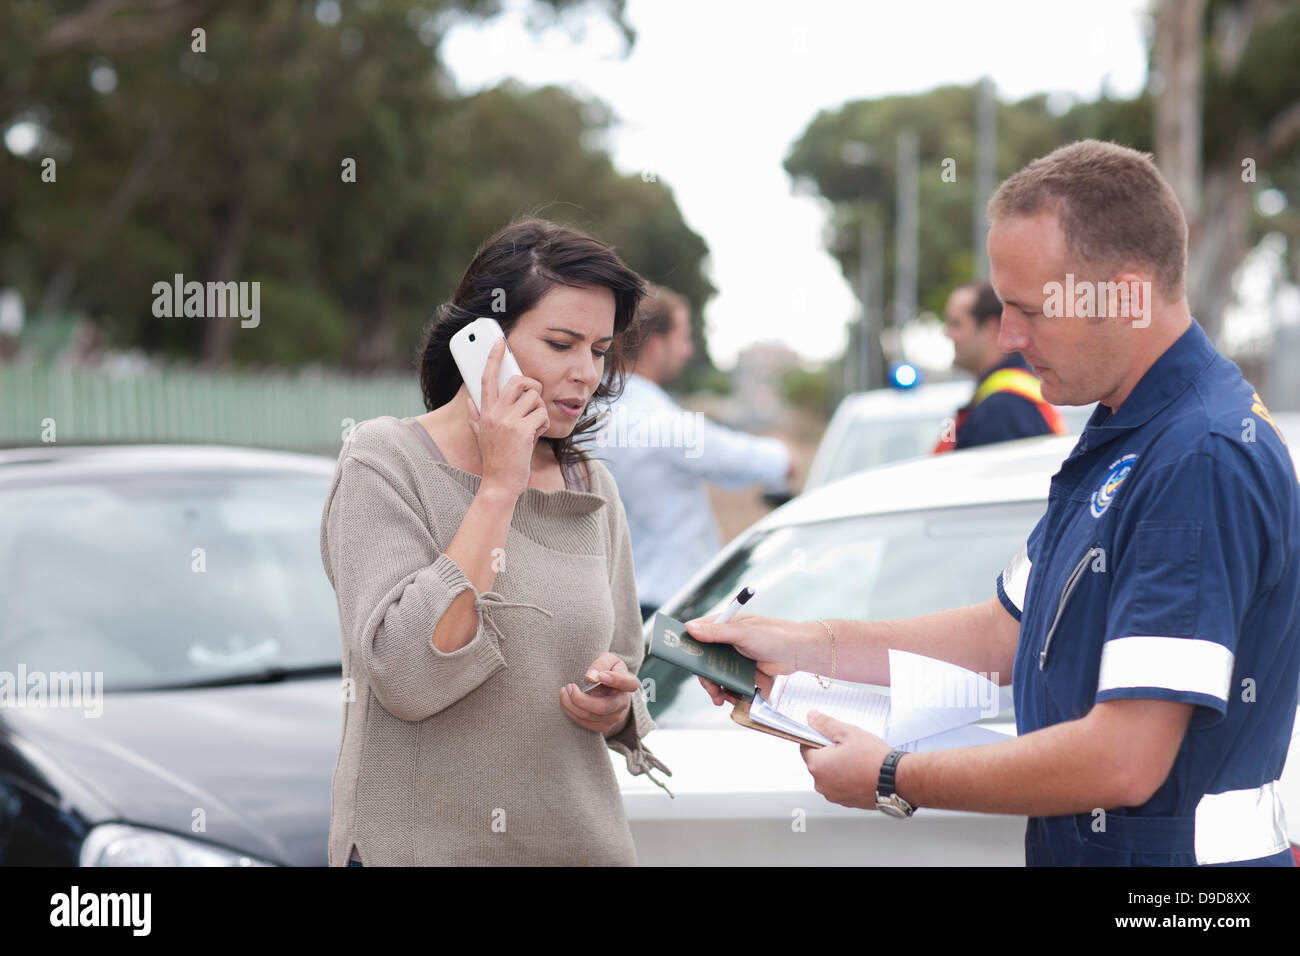 Car accident scene - Stock Image